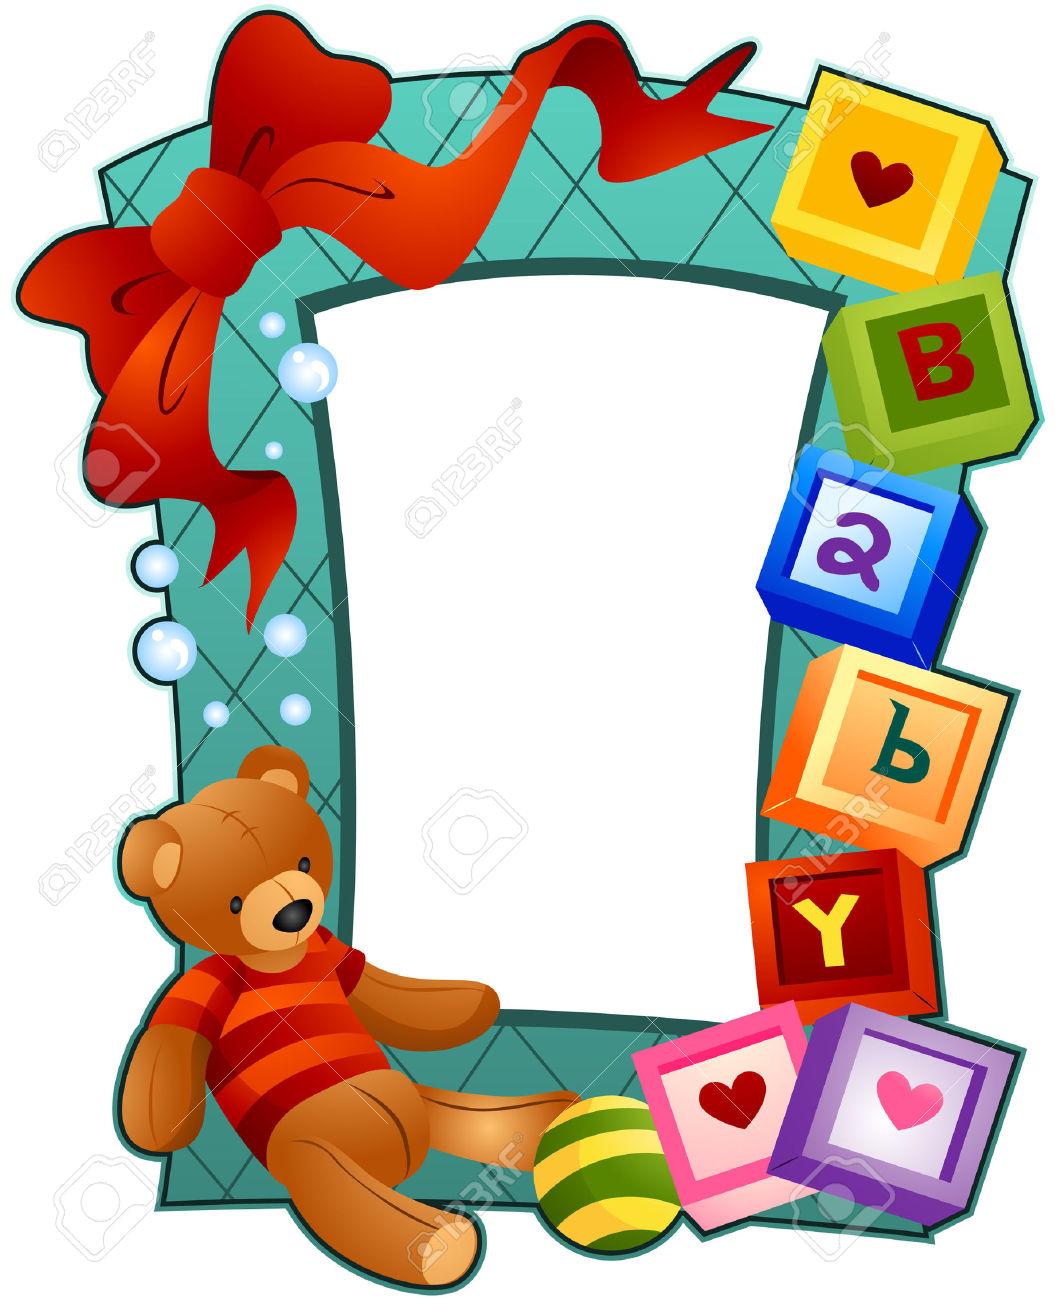 1061x1300 Baby Clip Art Borders And Frames 101 Clip Art